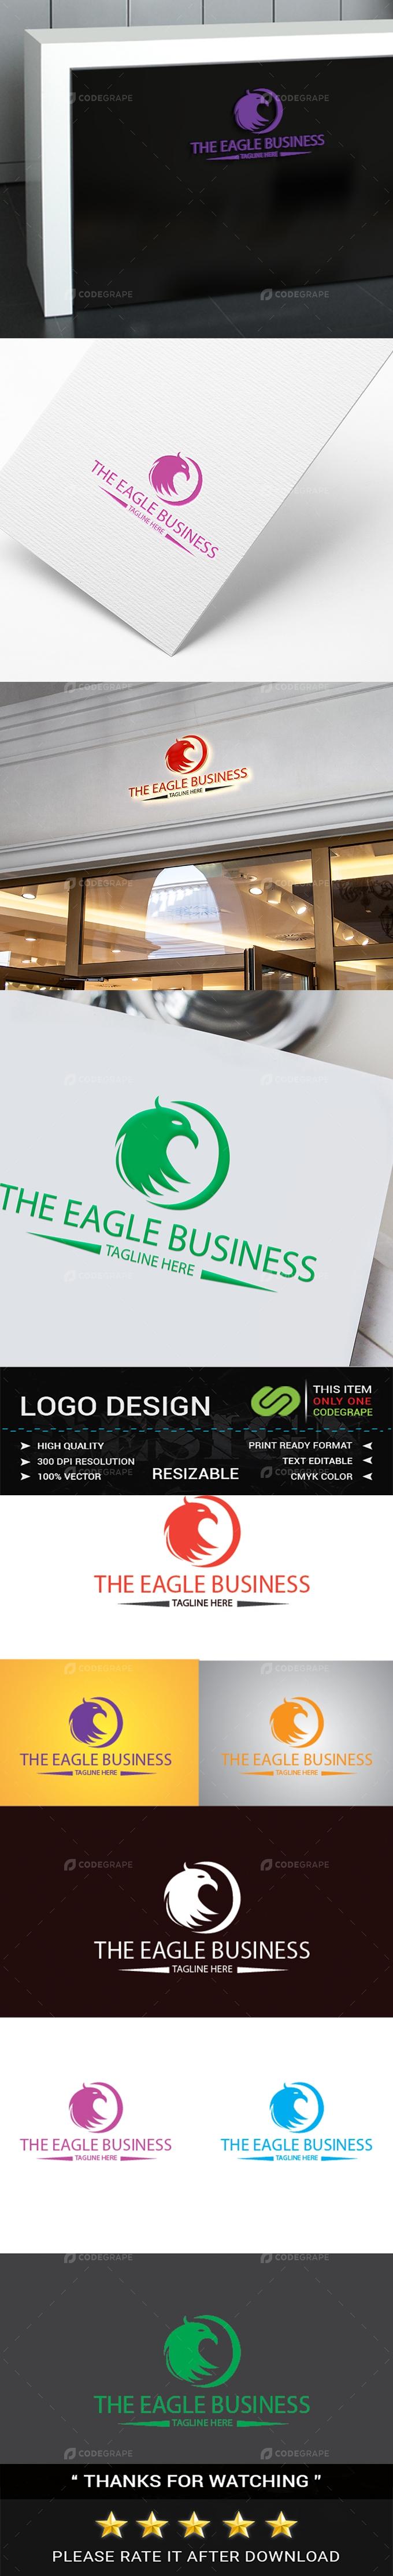 The Eagle Brand Logo